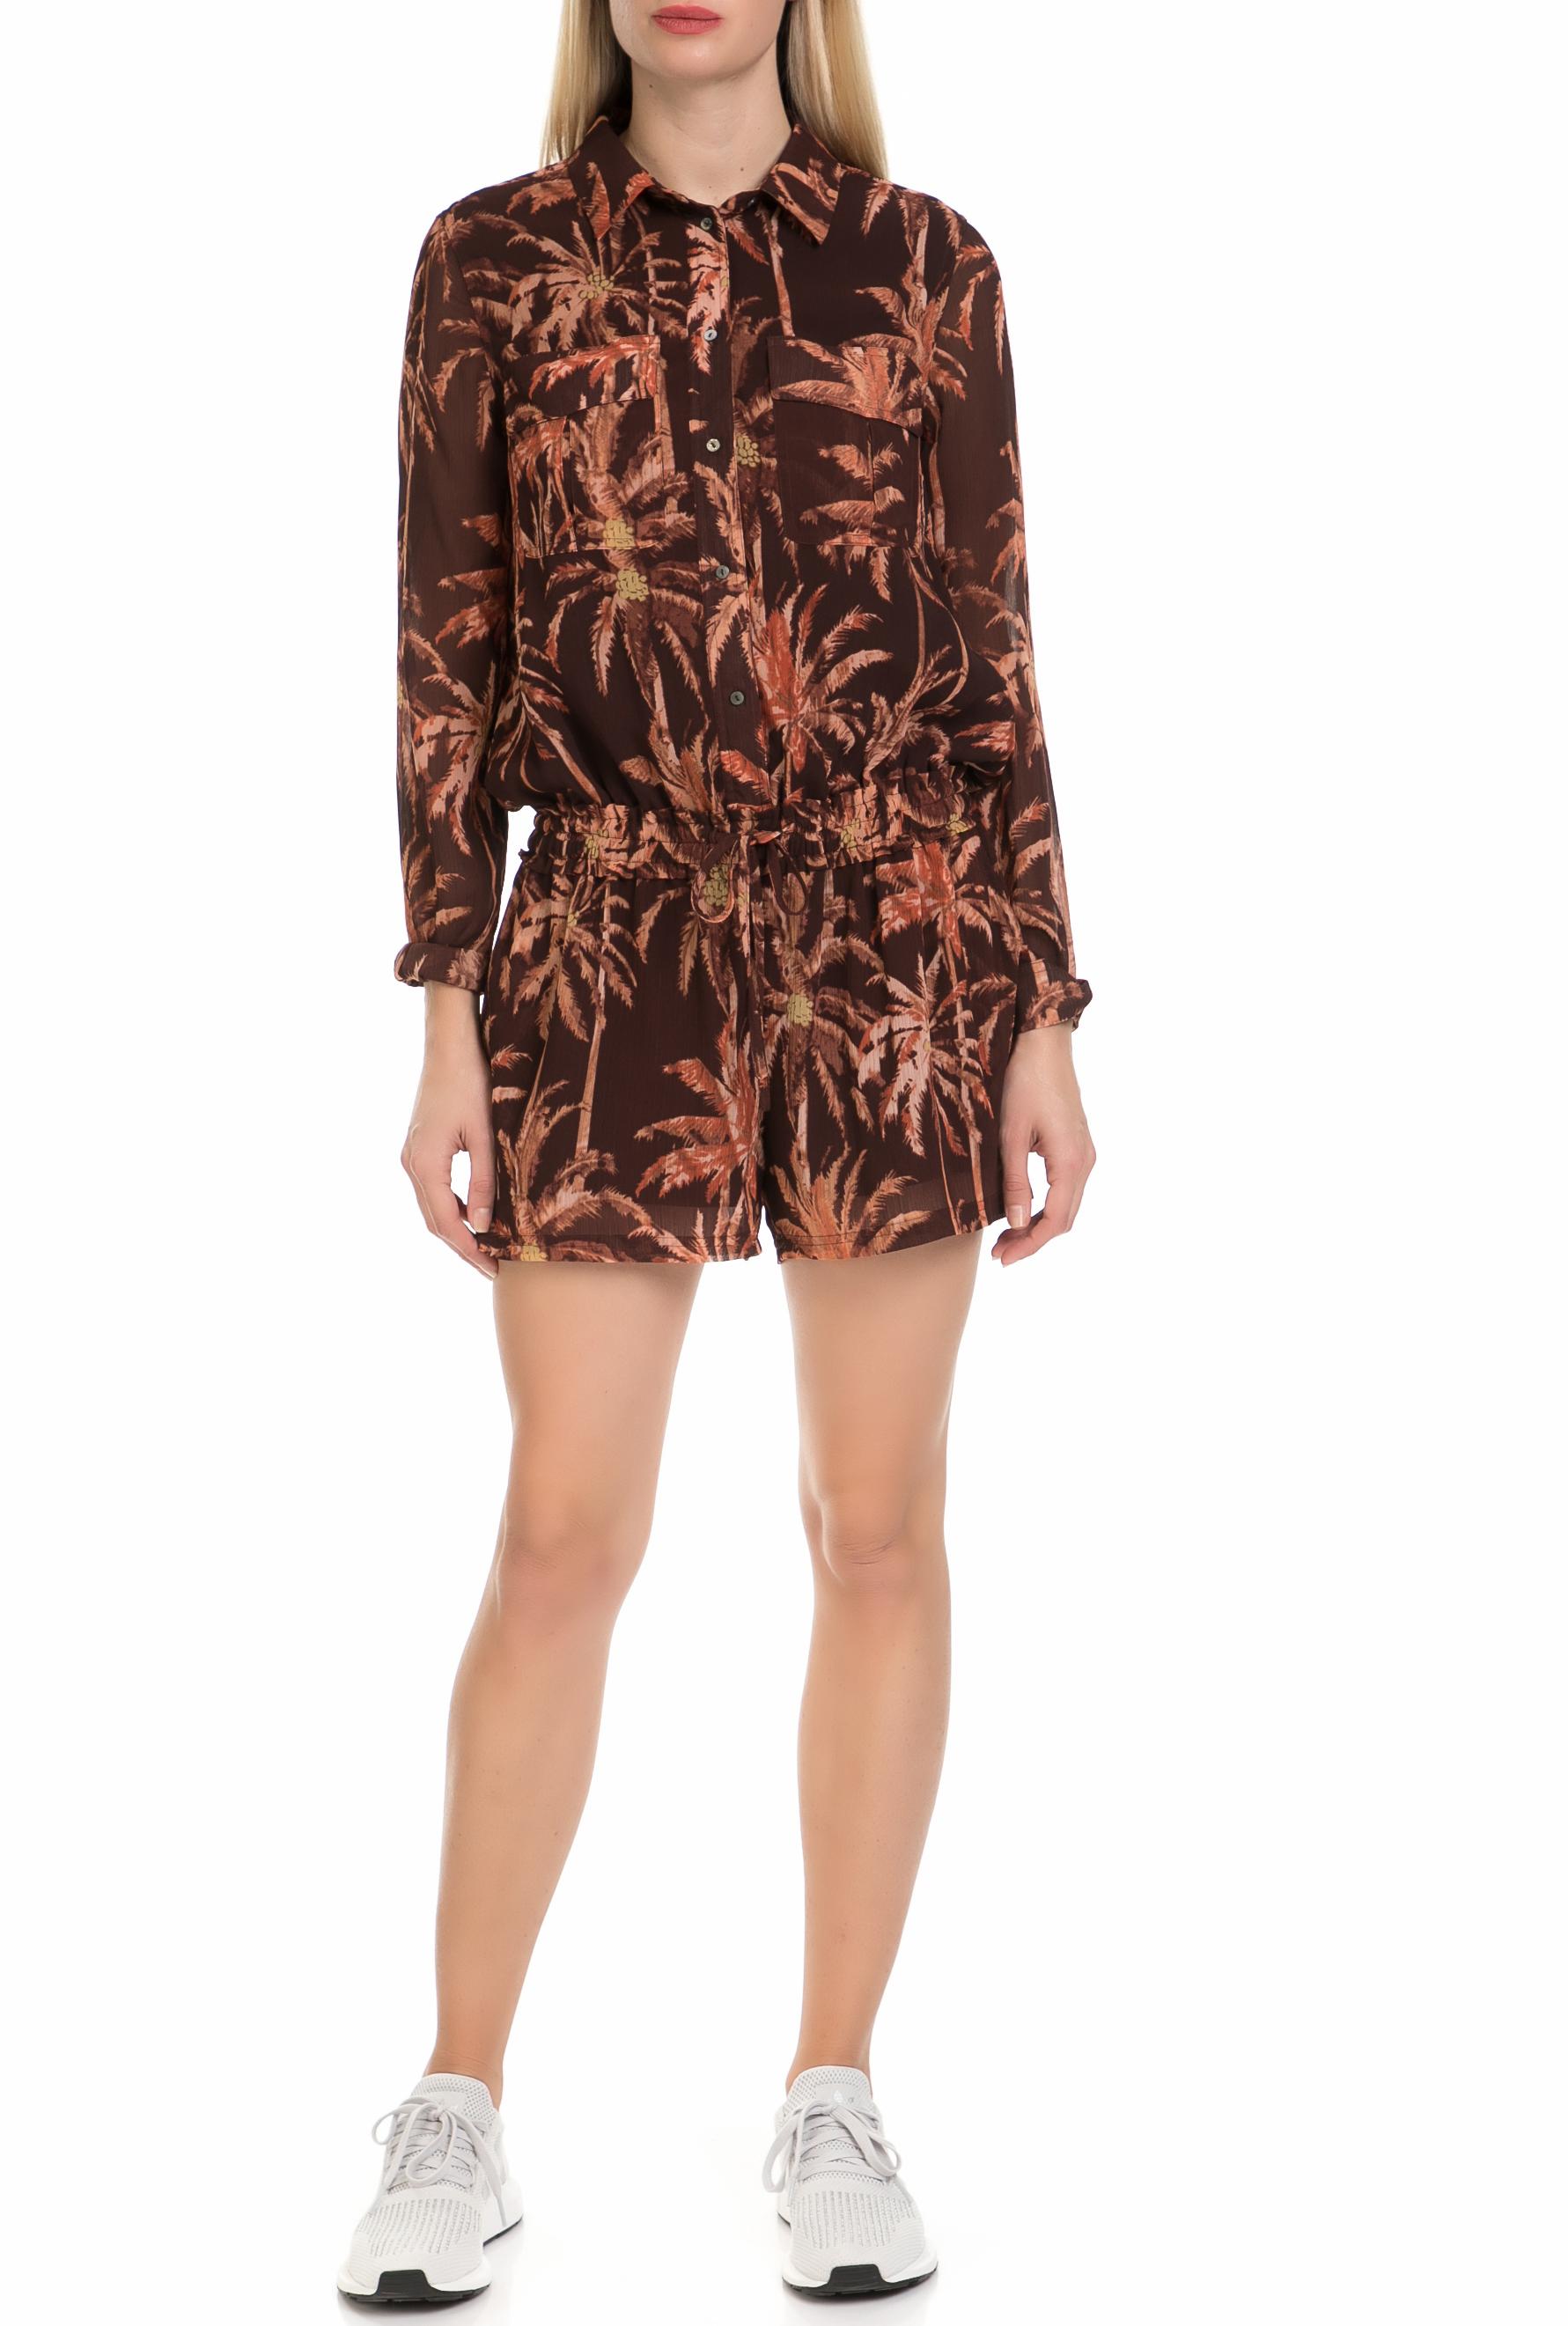 SCOTCH & SODA - Γυναικεία ολόσωμη φόρμα με σορτς SCOTCH & SODA καφέ